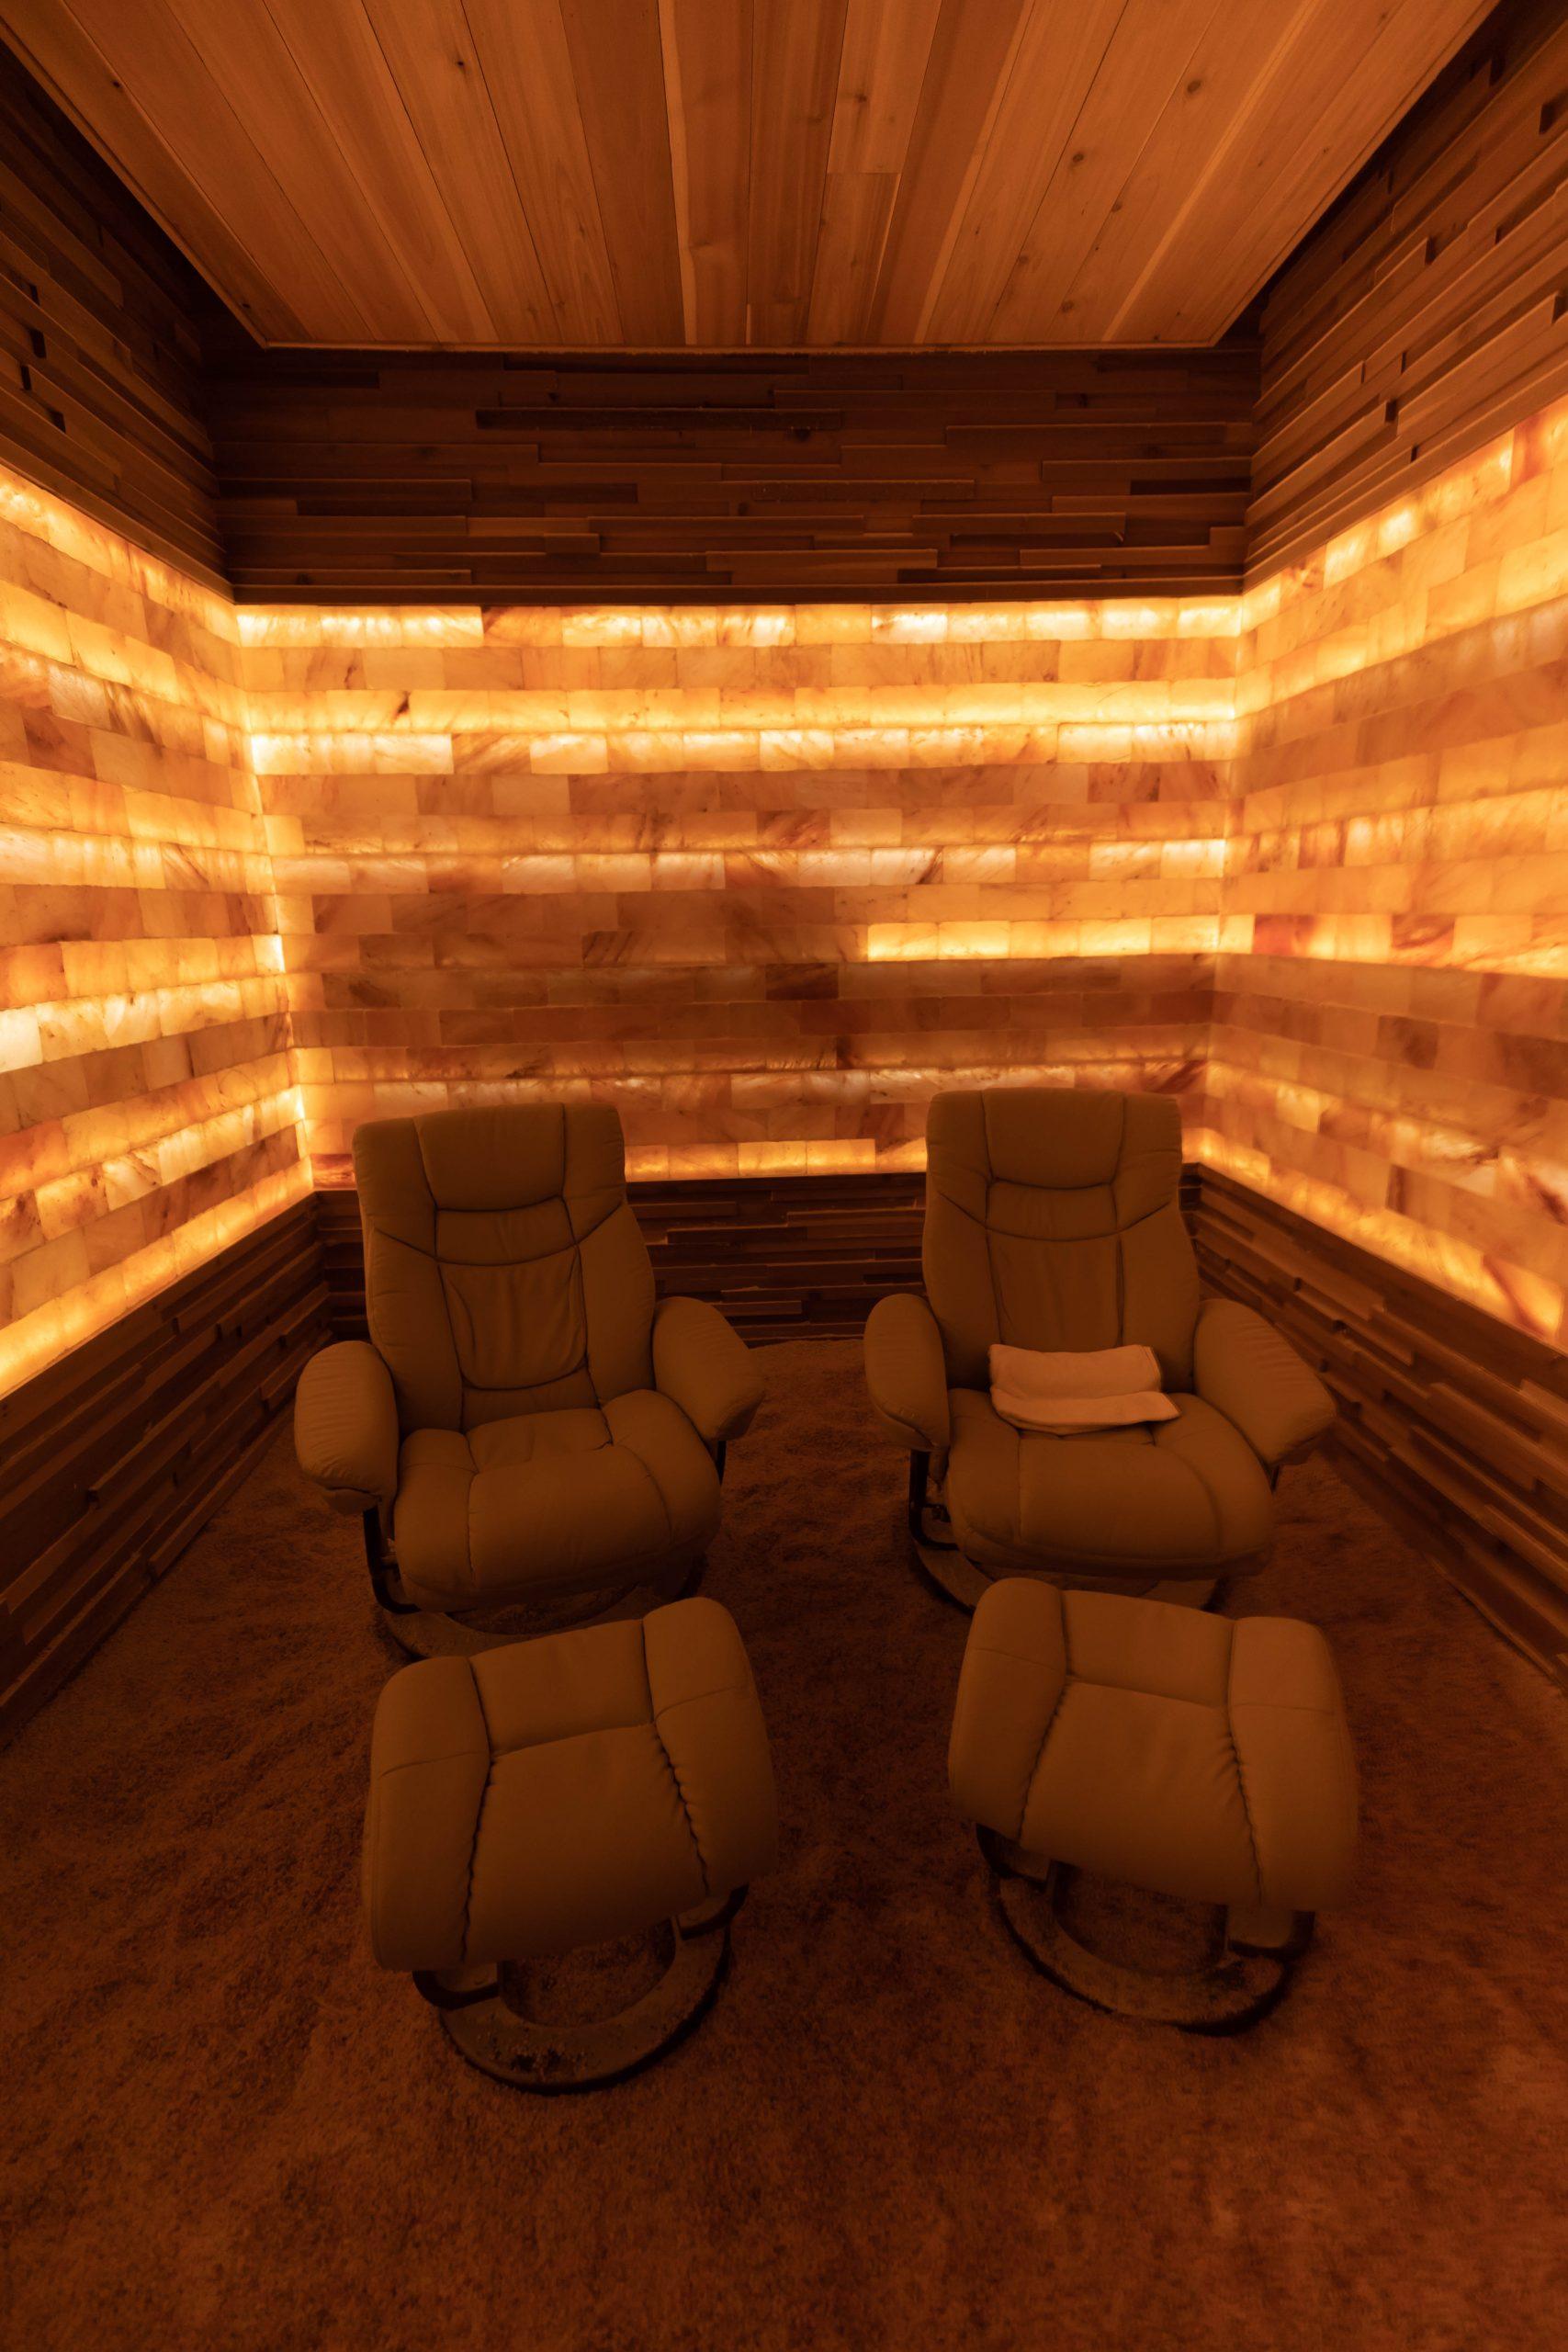 Himalayan Salt Therapy Room at Waldorf Astoria Orlando Hotel Orlando Florida by Annie Fairfax